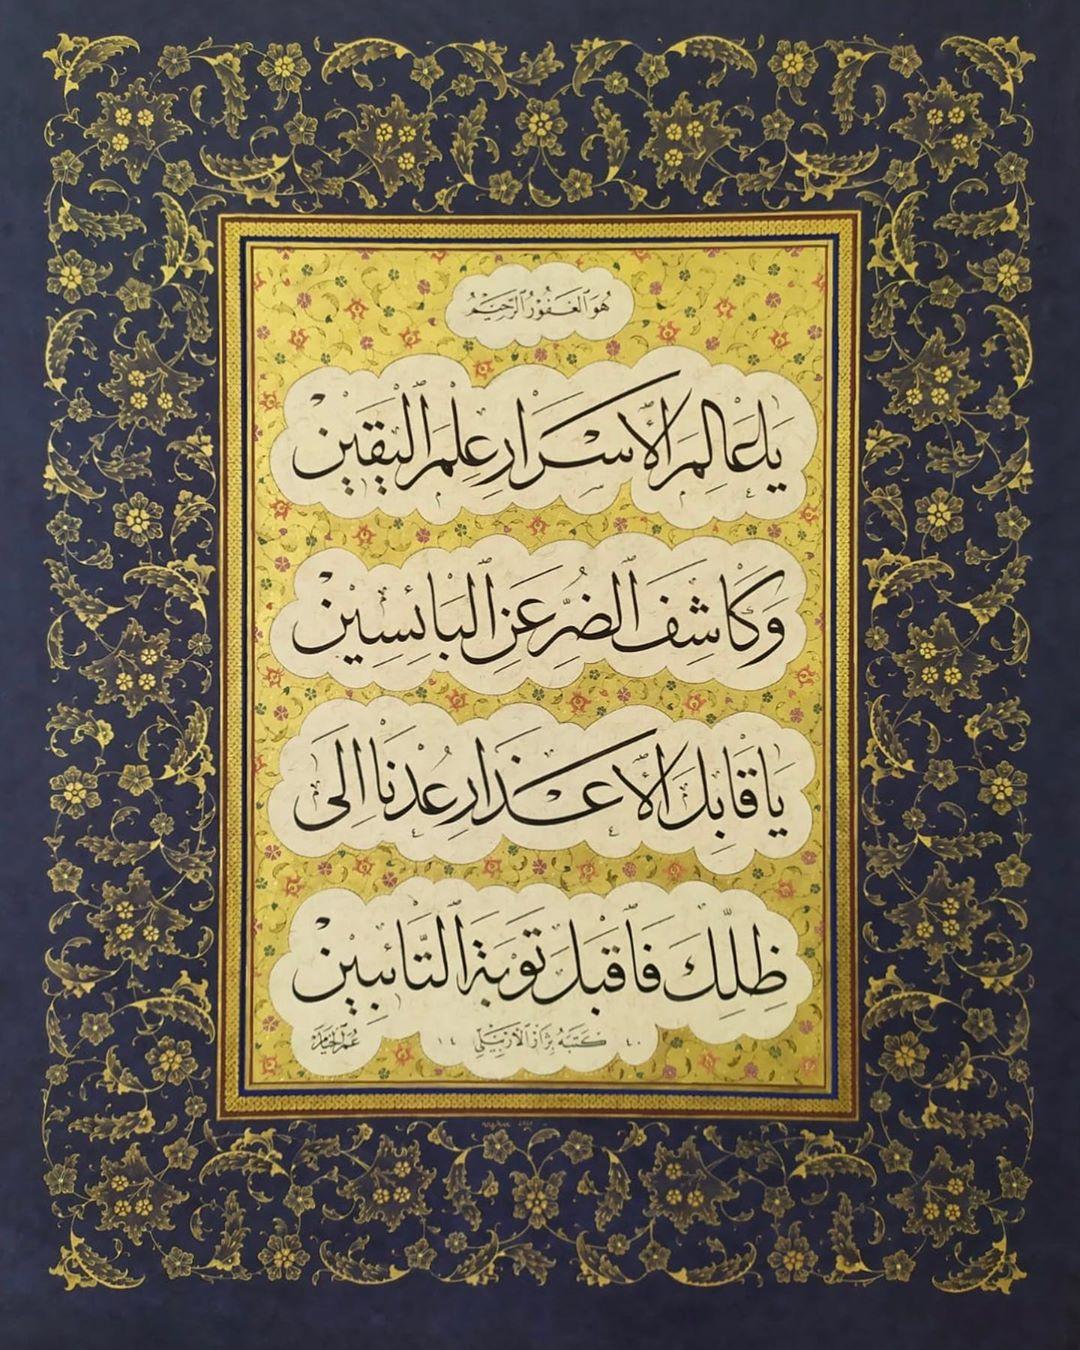 Professional Calligrapher Bijar Arbilly Calligraphy  من رباعيات عمر الخيام .. بخط الثلث من تذهيب المزخرفة ناگهان زان #calligraphy #ku… 364